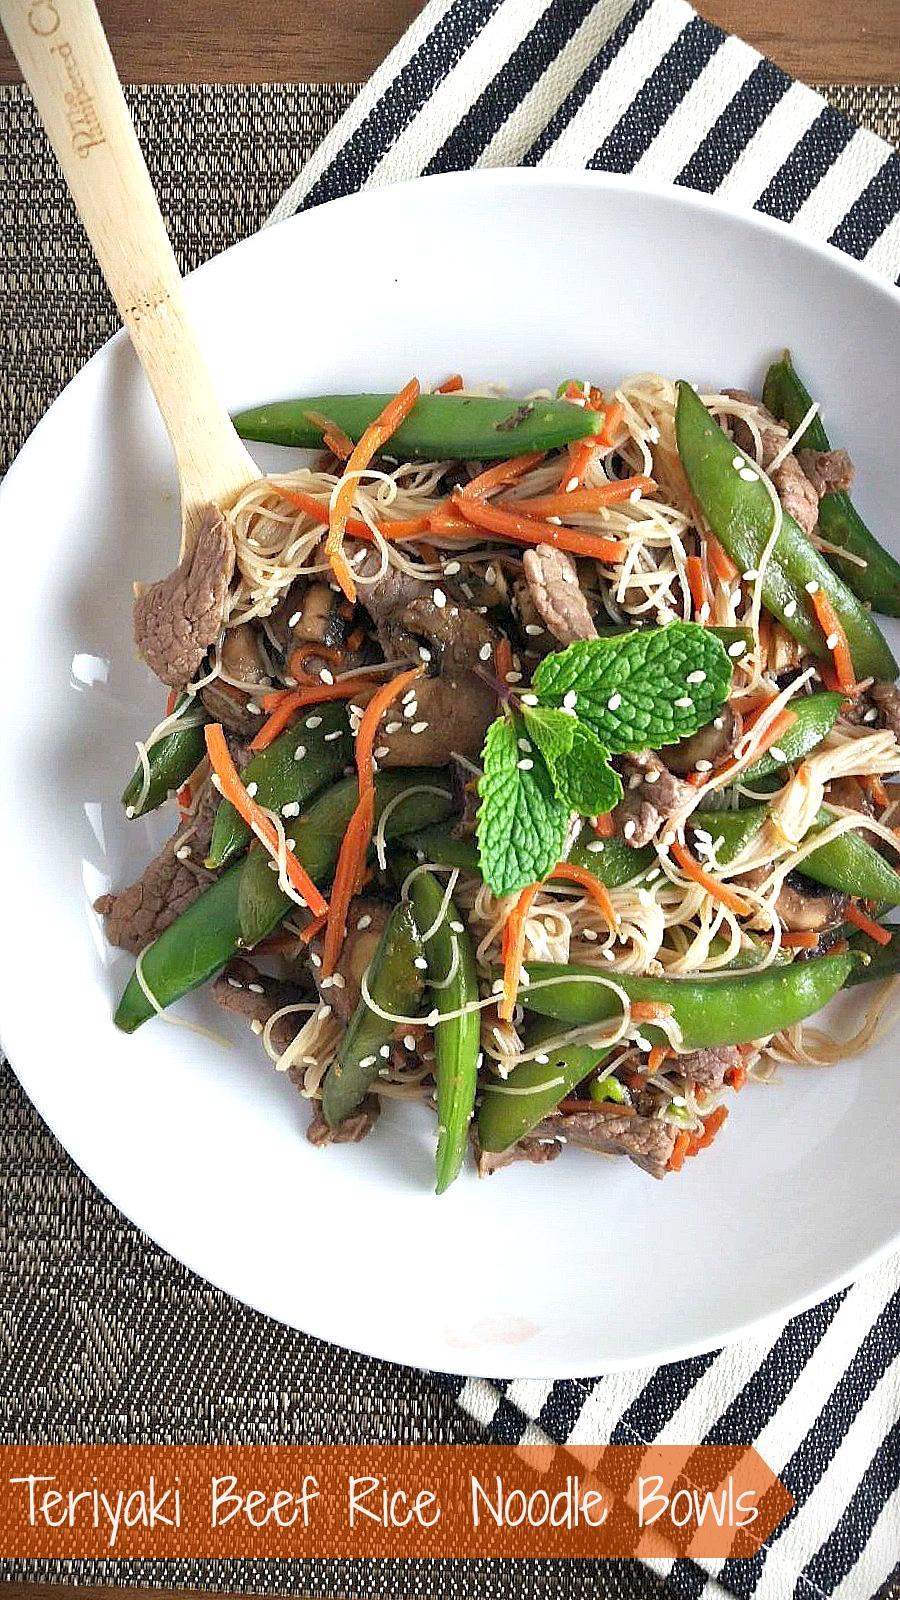 Teriyaki Beef Rice Noodle Bowls